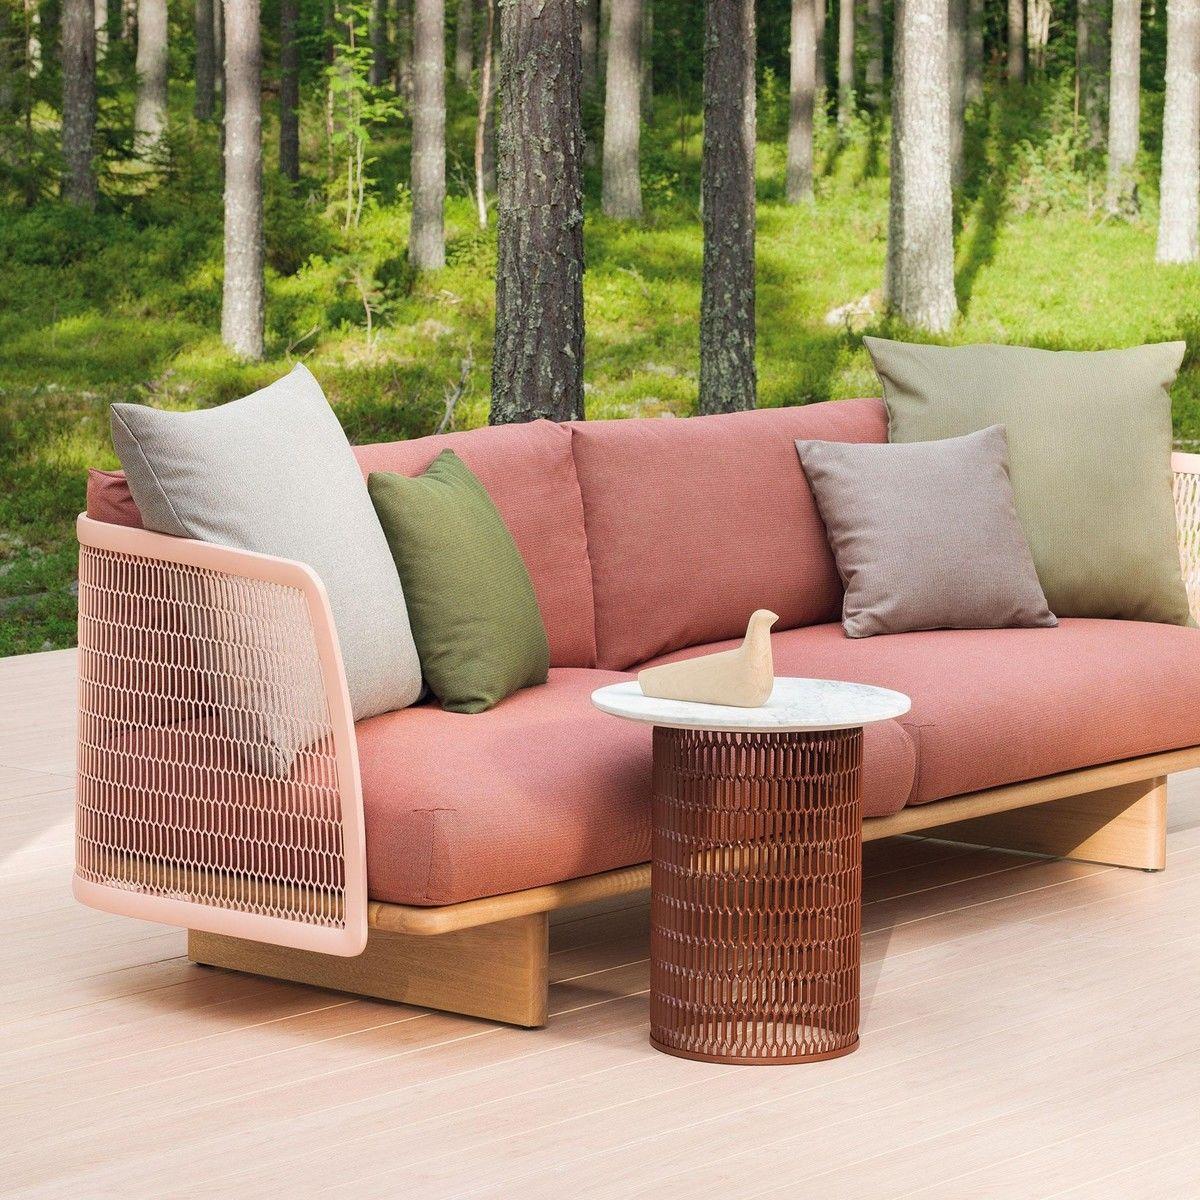 mesh canap outdoor kettal. Black Bedroom Furniture Sets. Home Design Ideas